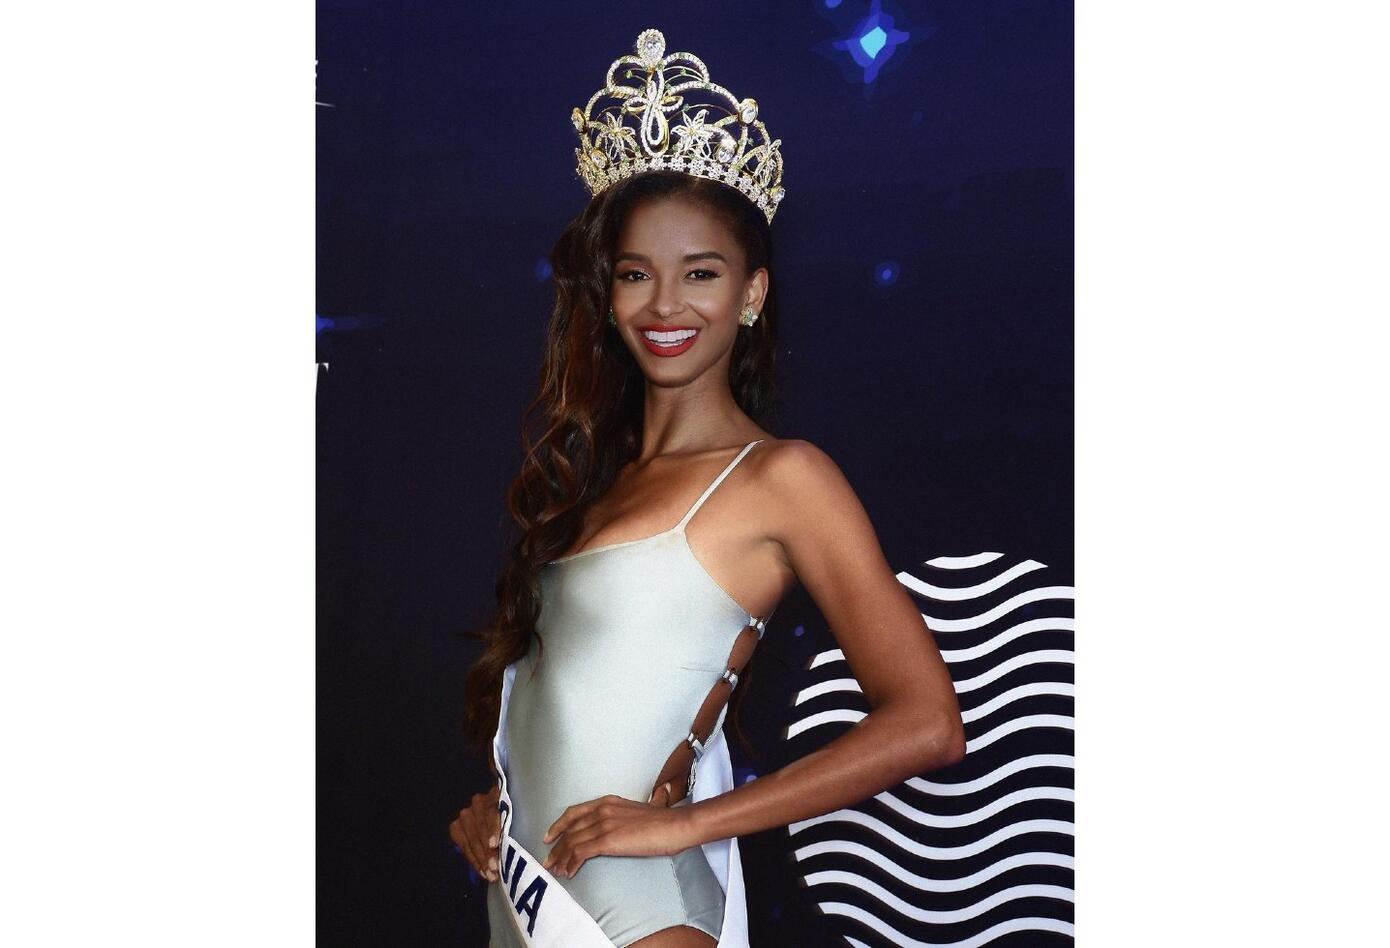 Miss Antioquia, Carolina Londoño